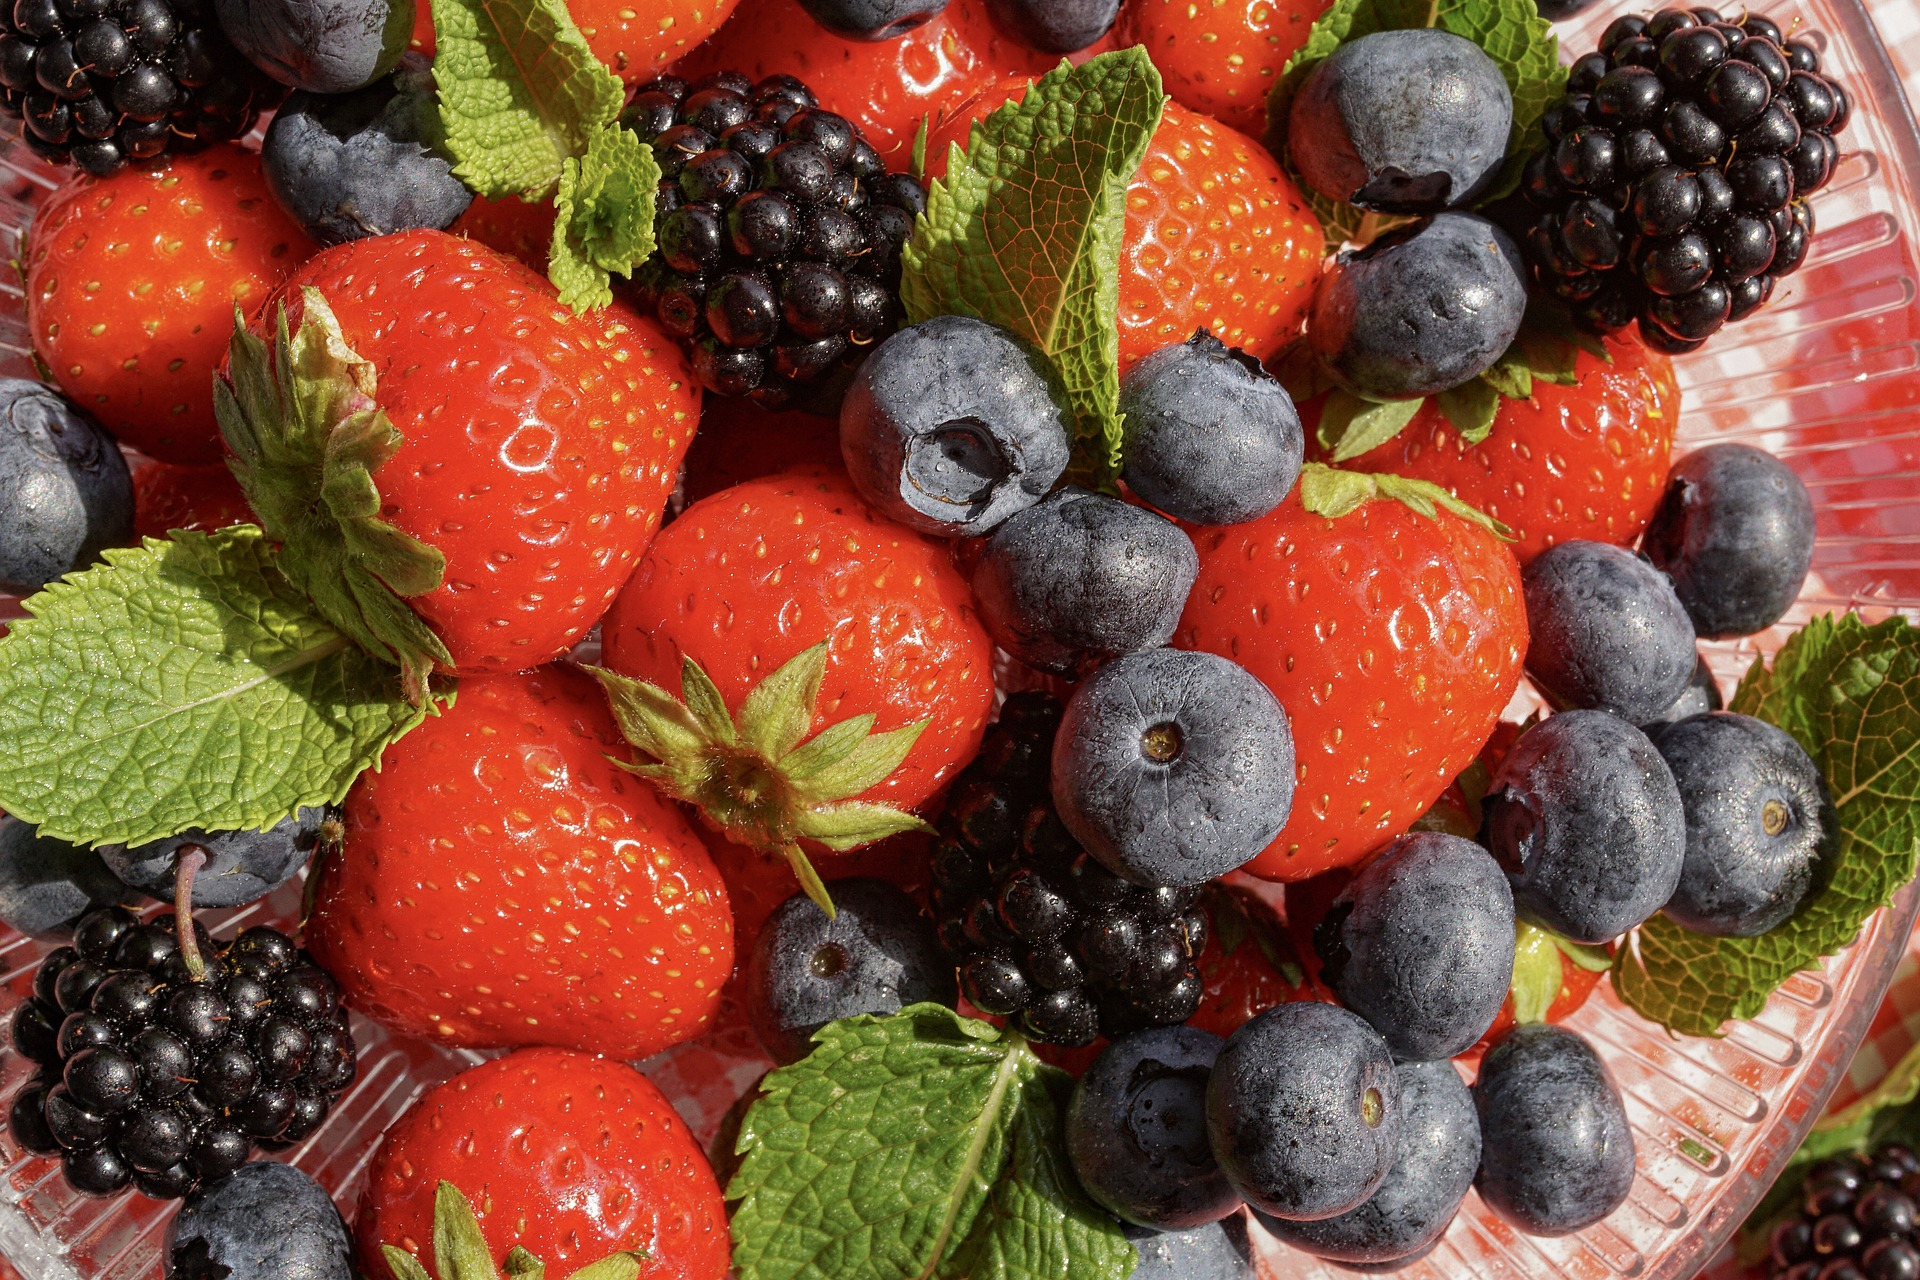 Juicing Berries for Summer